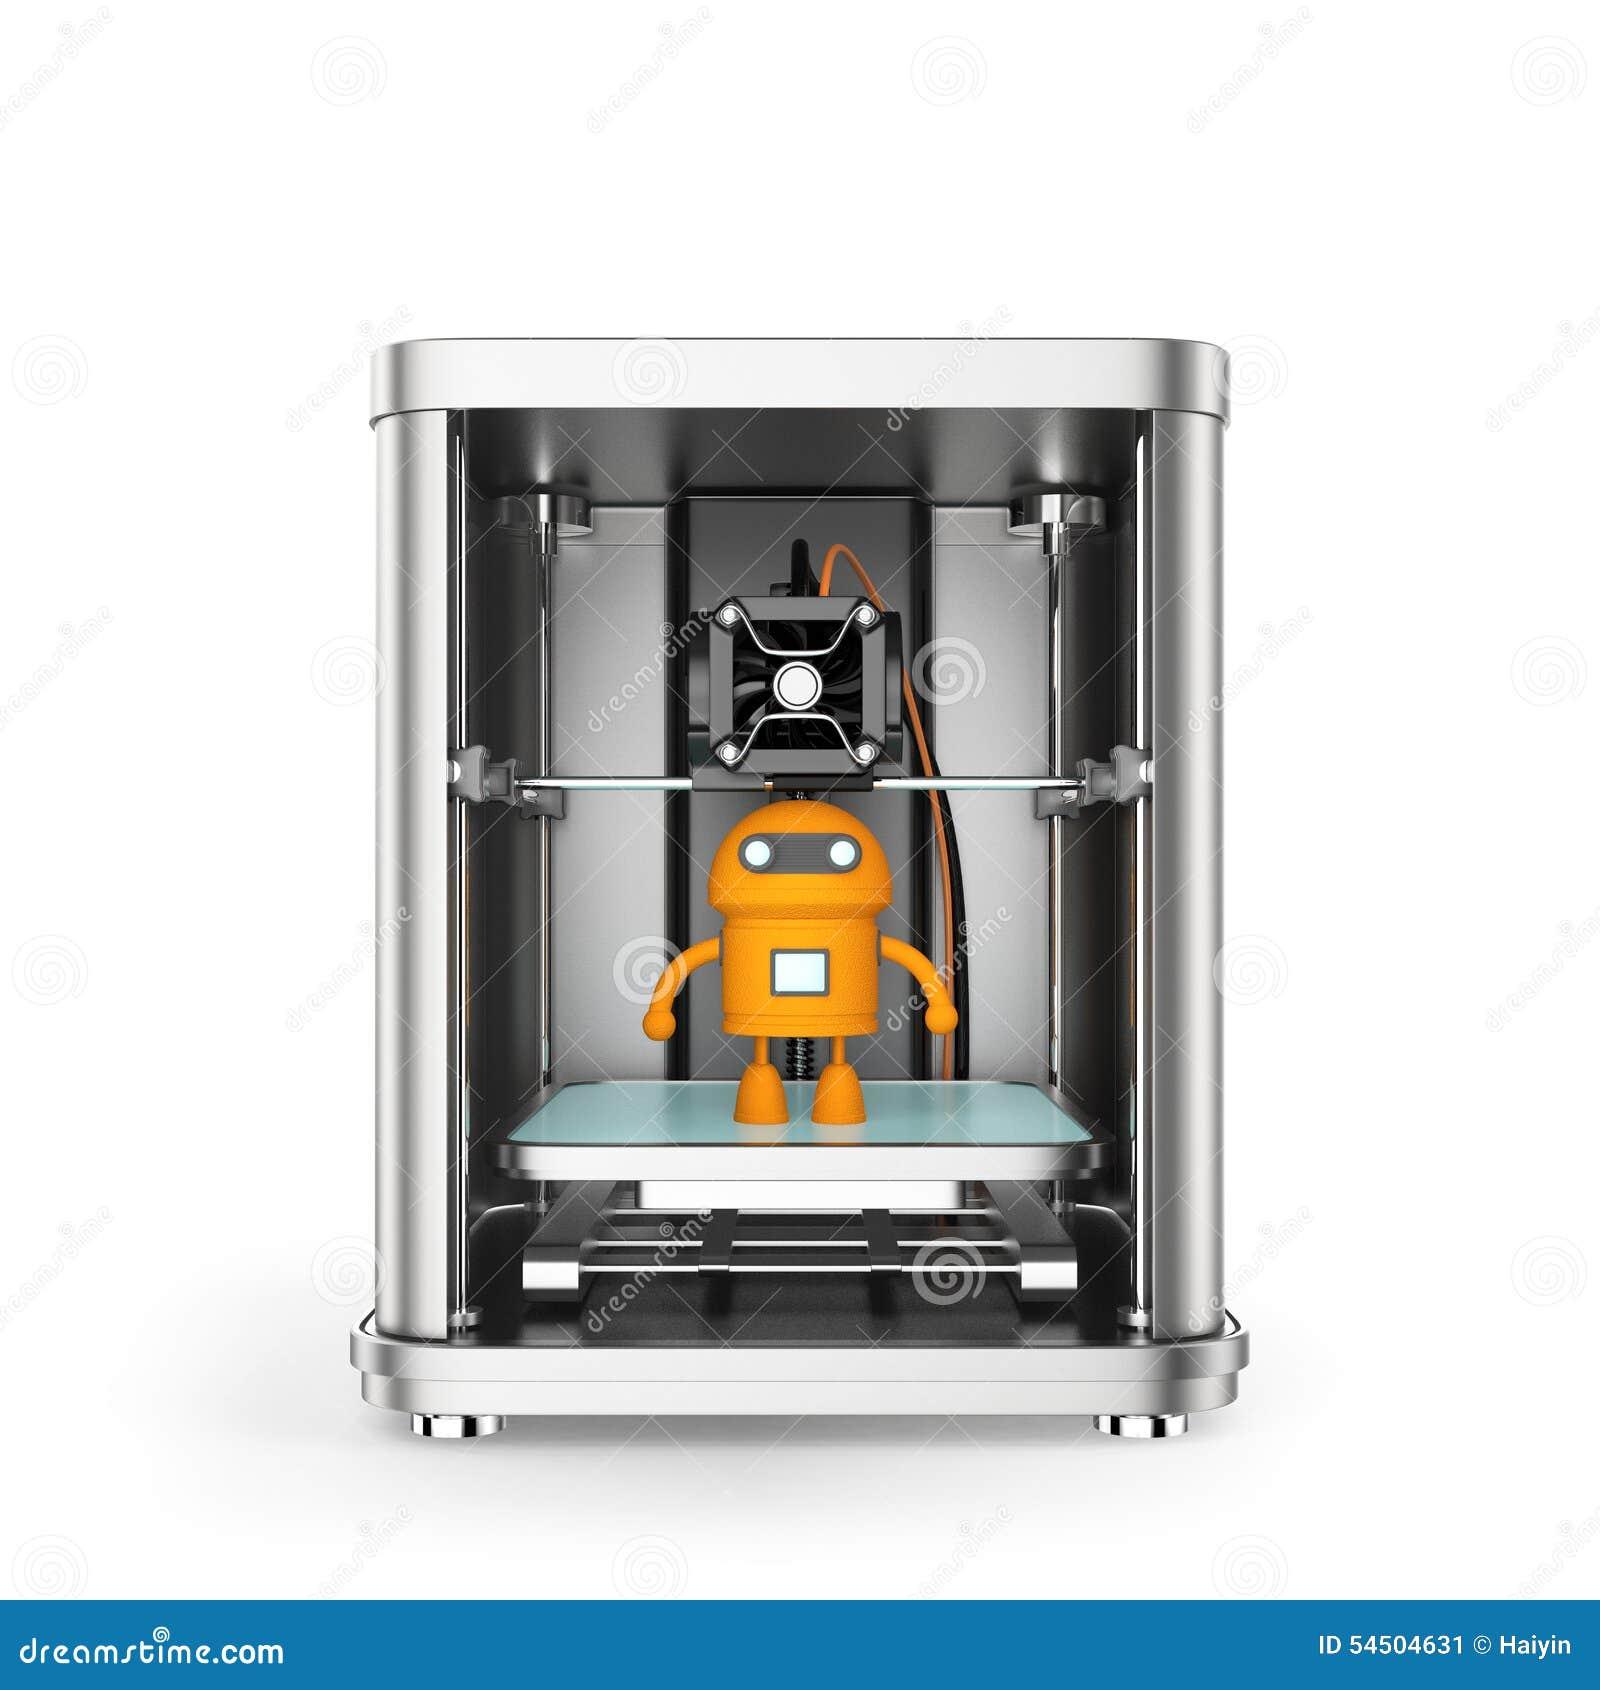 Diagram Kyocera Printer Wiring Diagrams Laser Symbol Circuit Manufacturers In Lulusoso Toner Cartridge Refill Maker Home Printers Who Sells